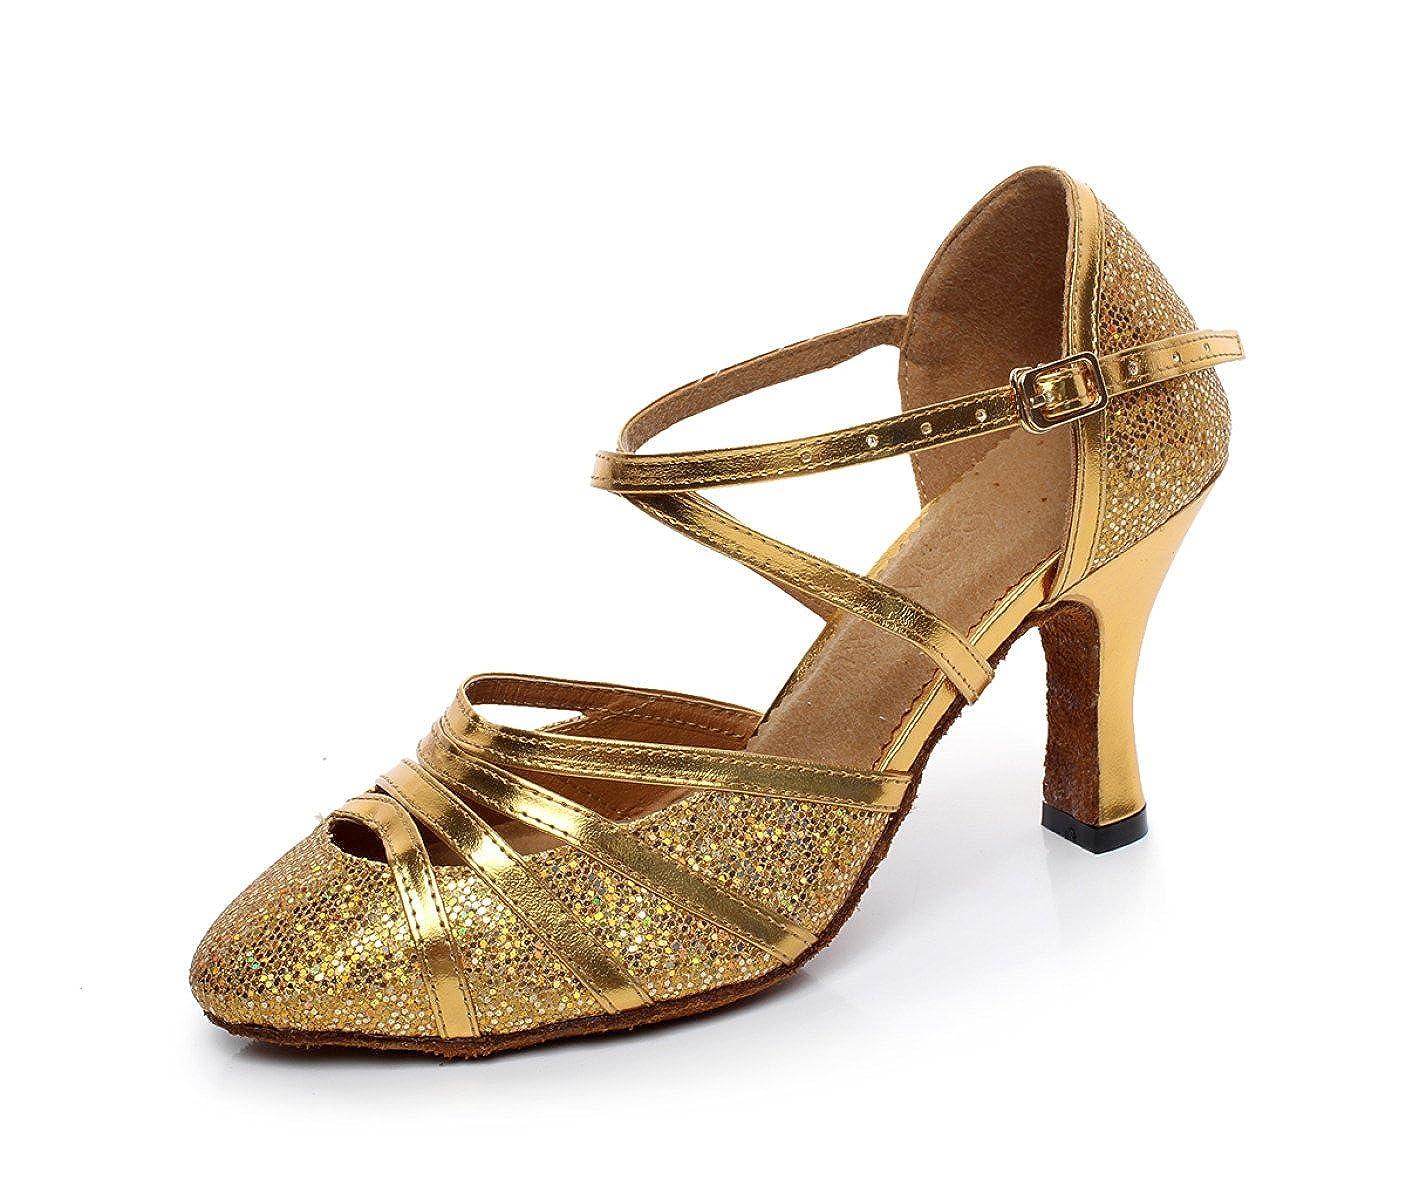 JSHOE Womens Fermé Toe Talon Haut 13980 PU Danse Cuir Chaussures Paillettes Salsa Tango Ballroom Chaussures De Danse Latine,Gold-heeled6cm-UK5.5/EU38/Our39 - 16691f6 - jessicalock.space